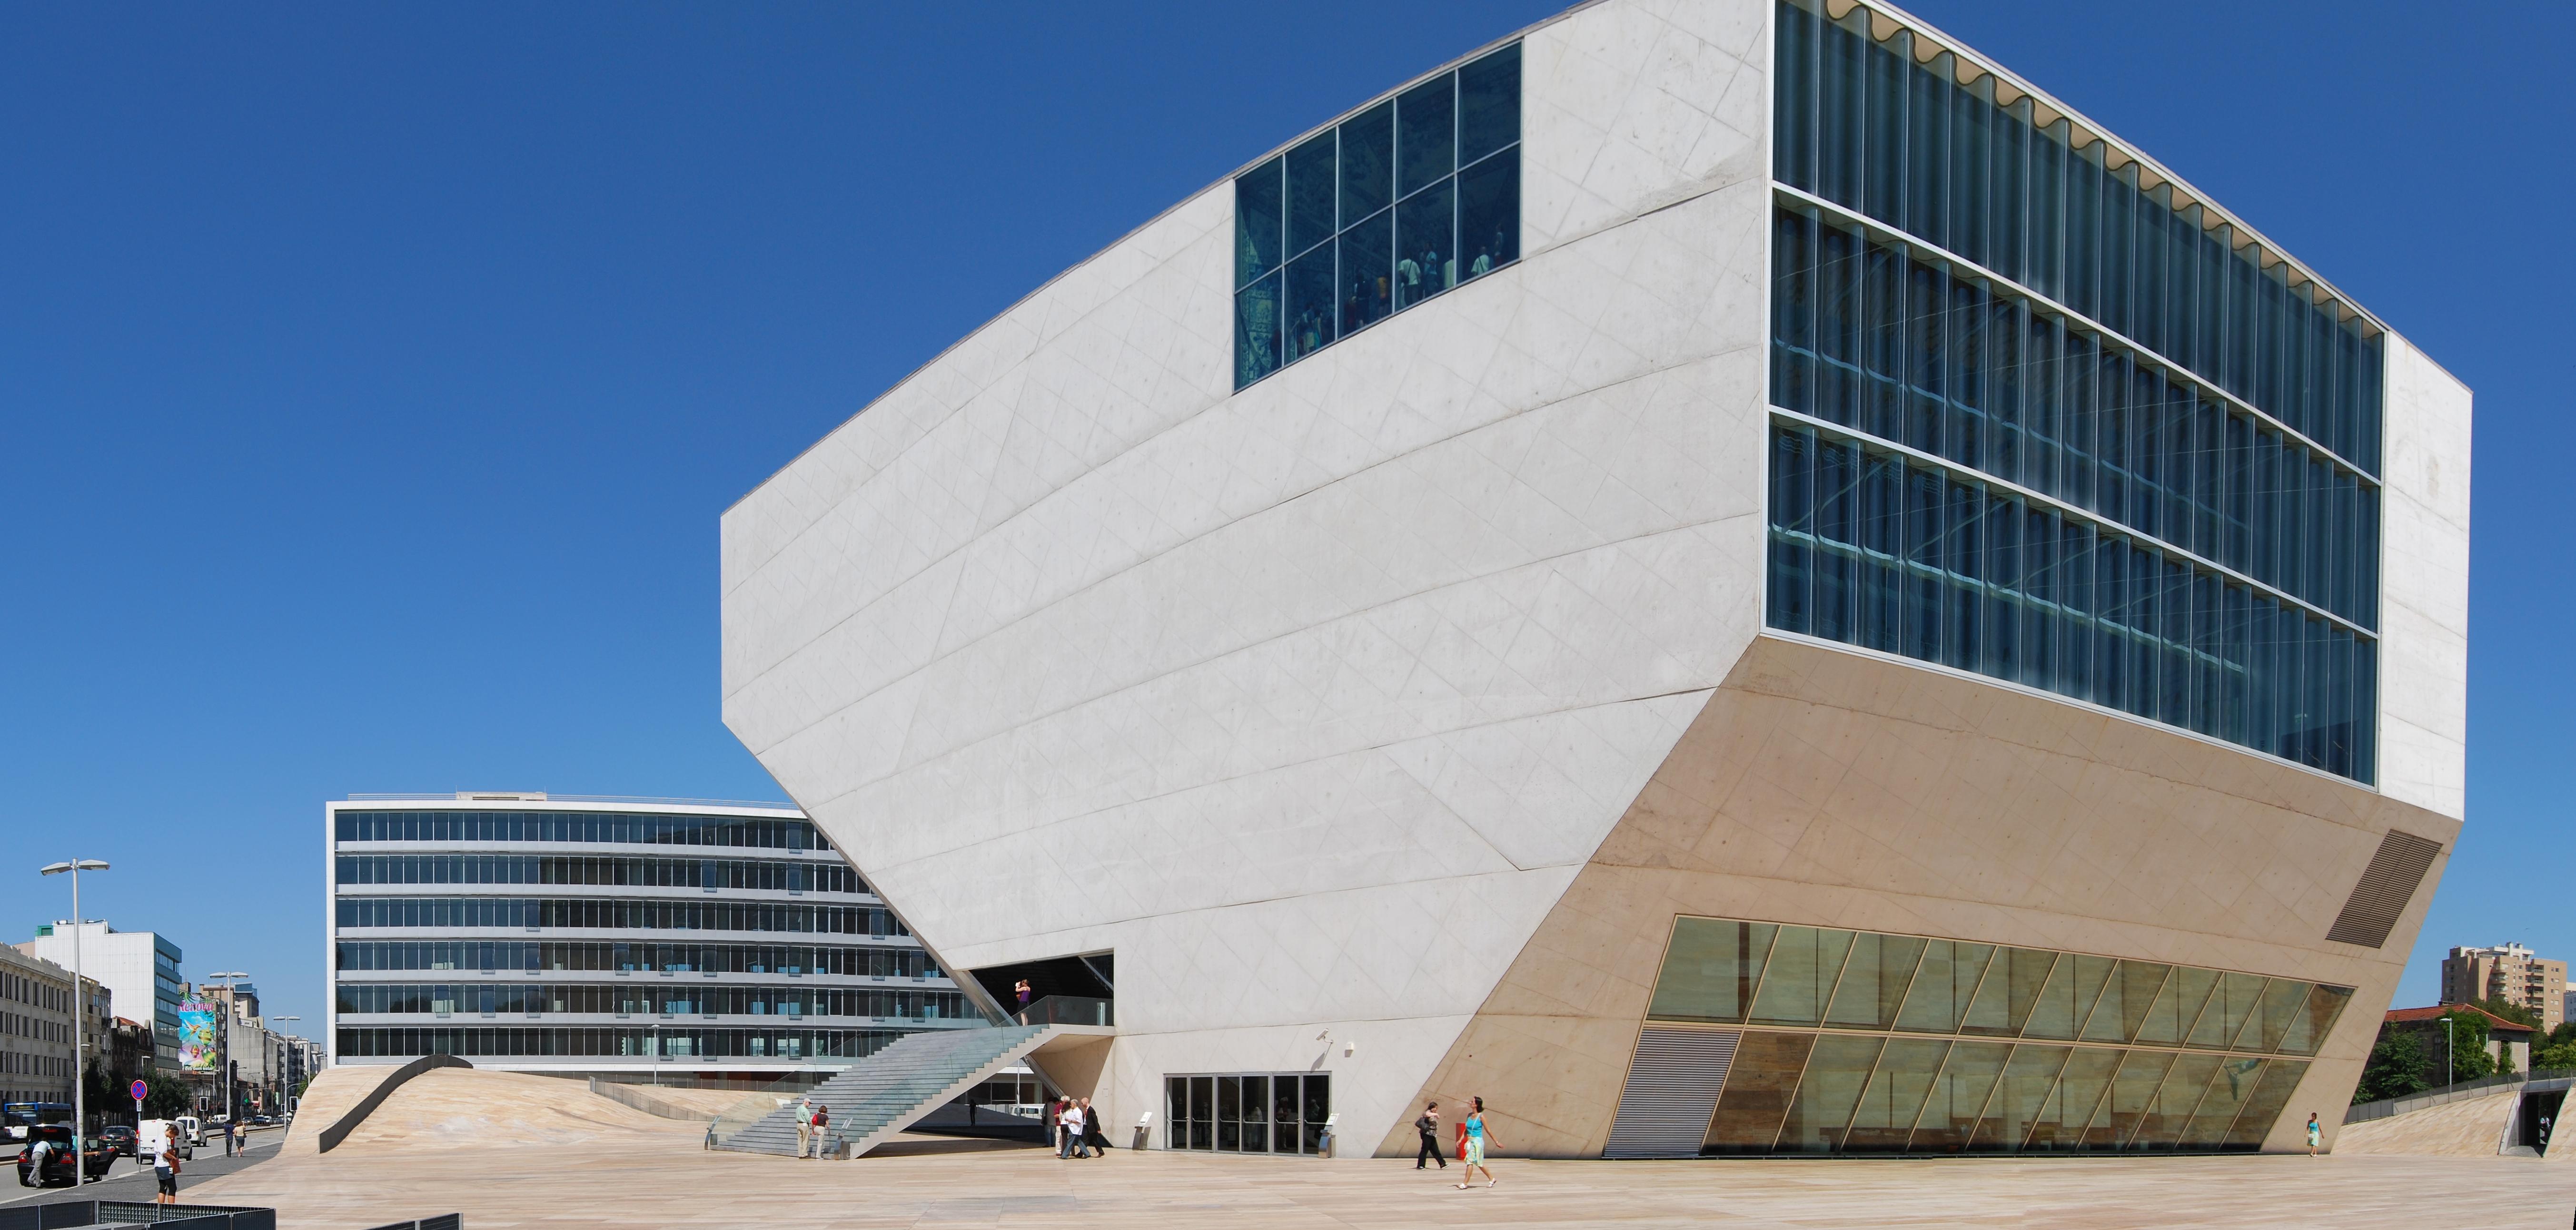 Casa da musica the cultural landmark for Cassa musica